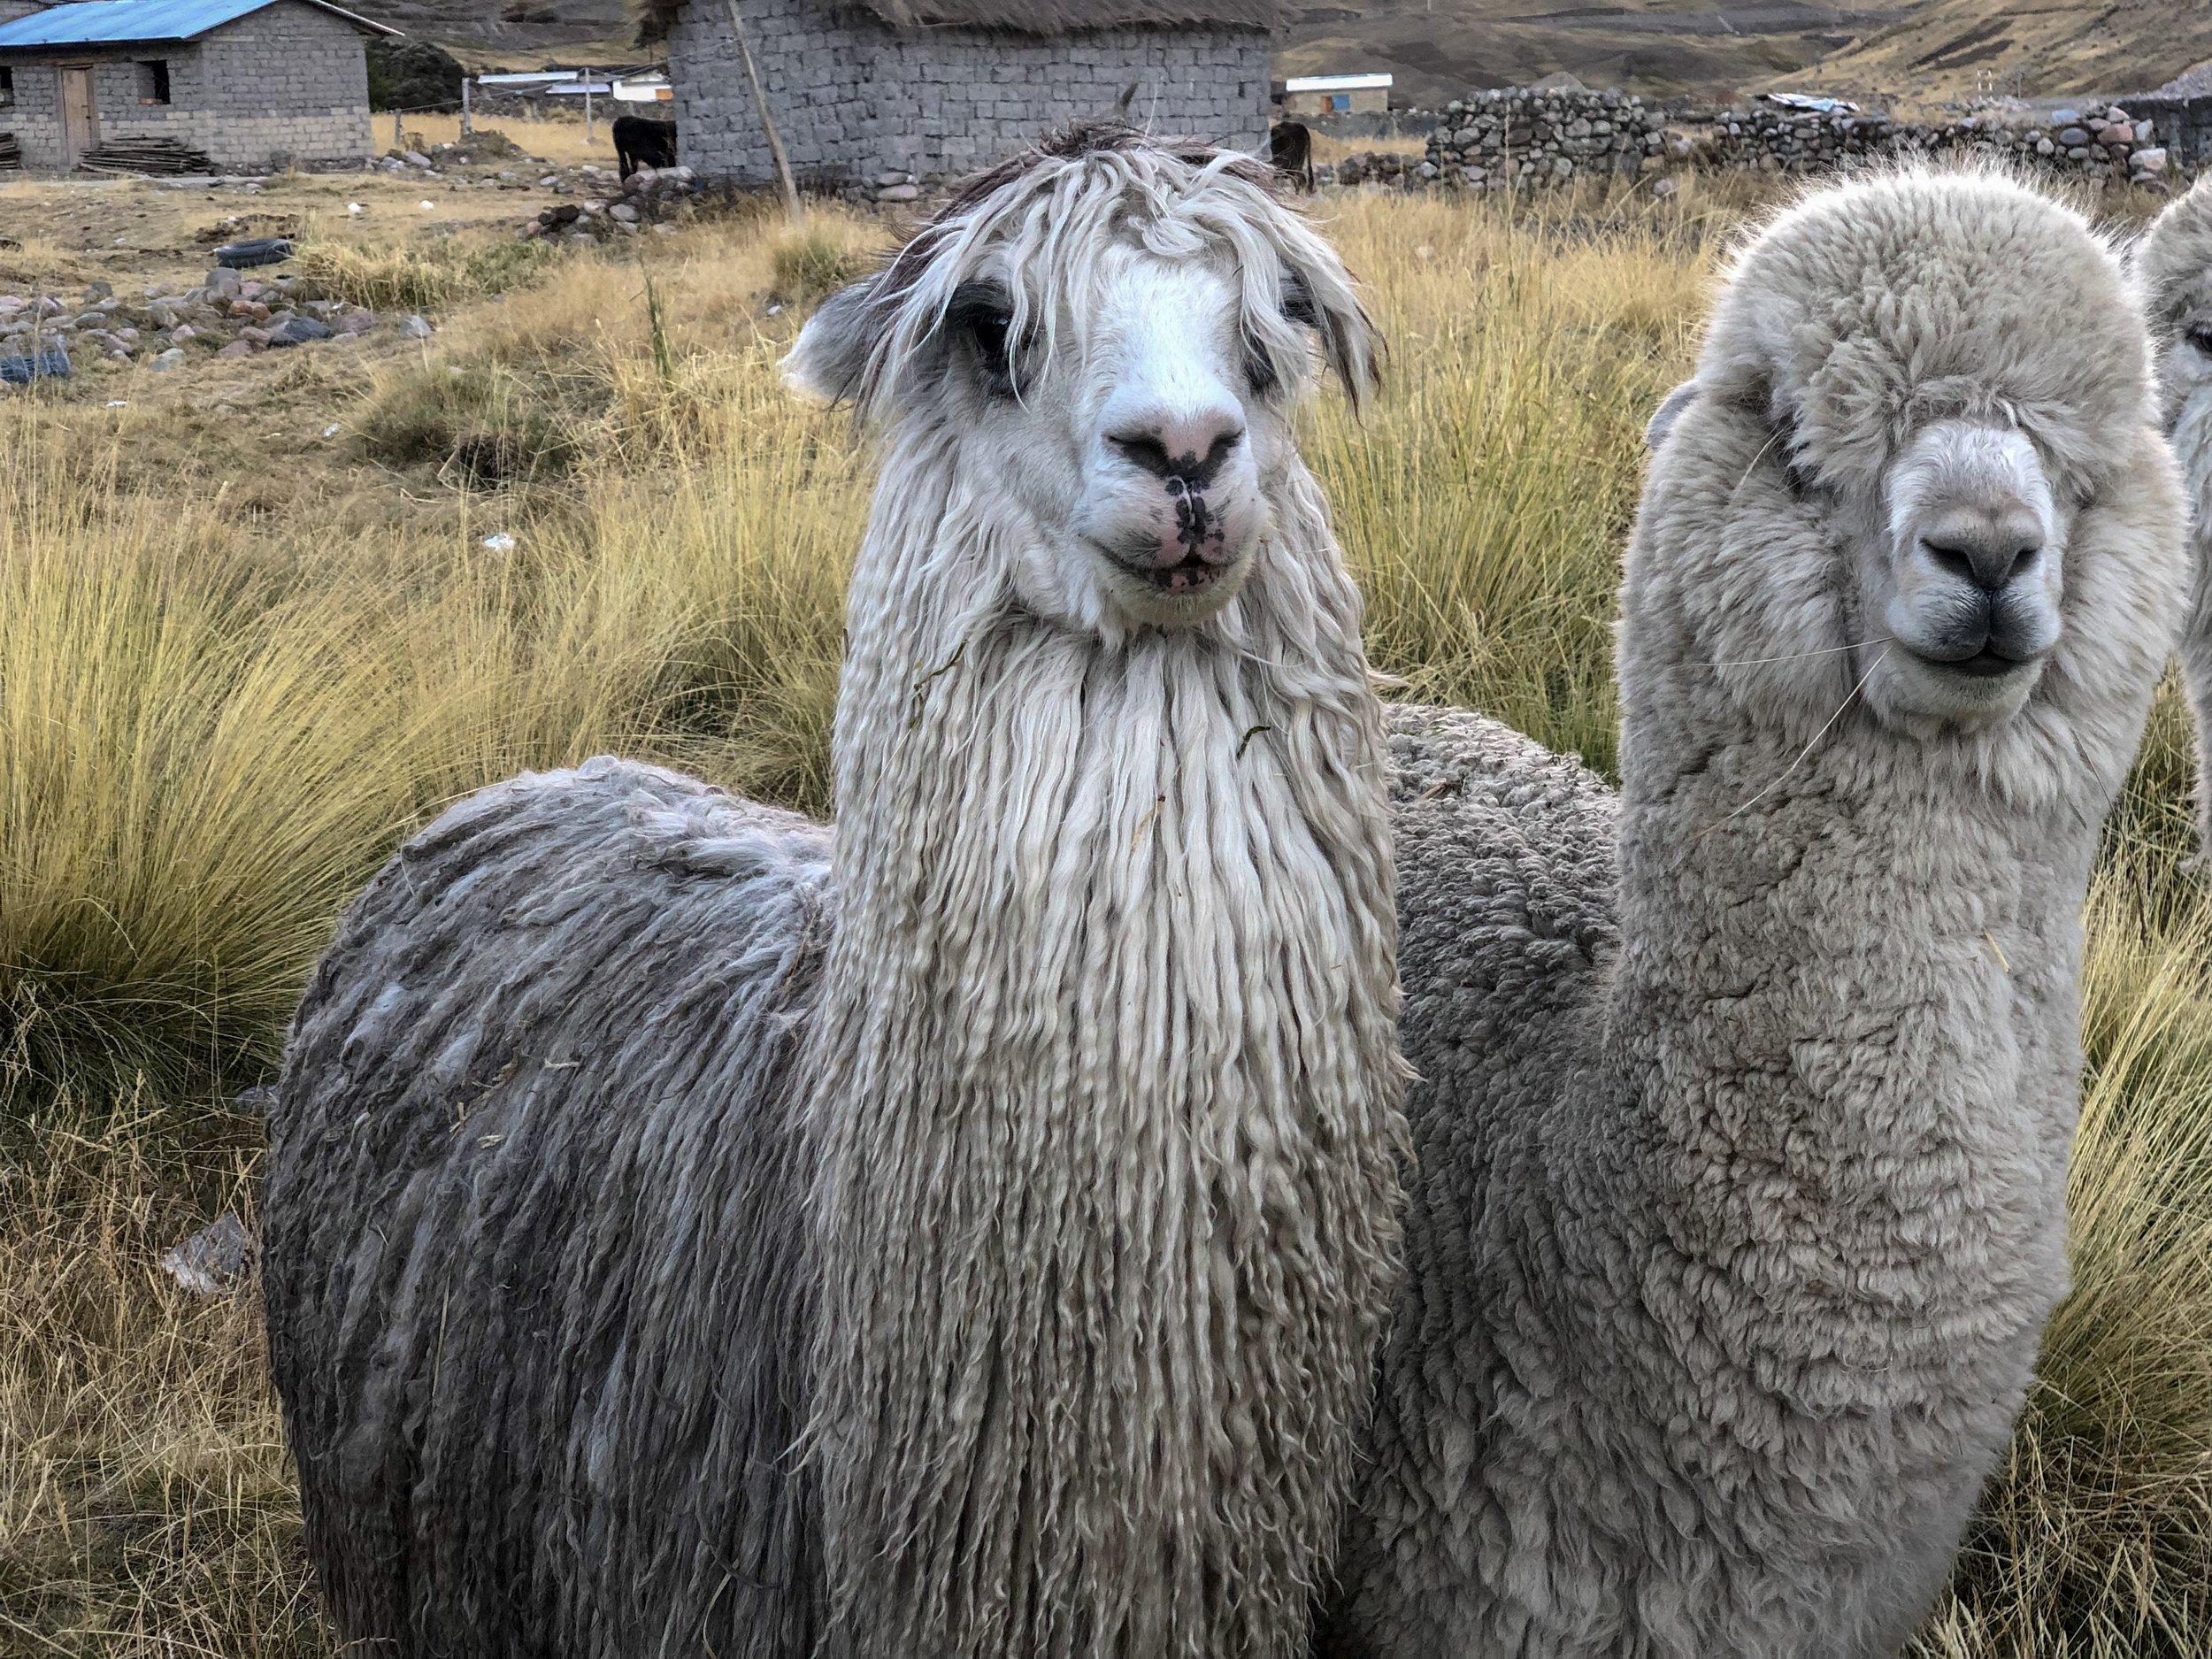 There are two breeds of alpaca; the Suri alpacaand the Huacaya alpaca.